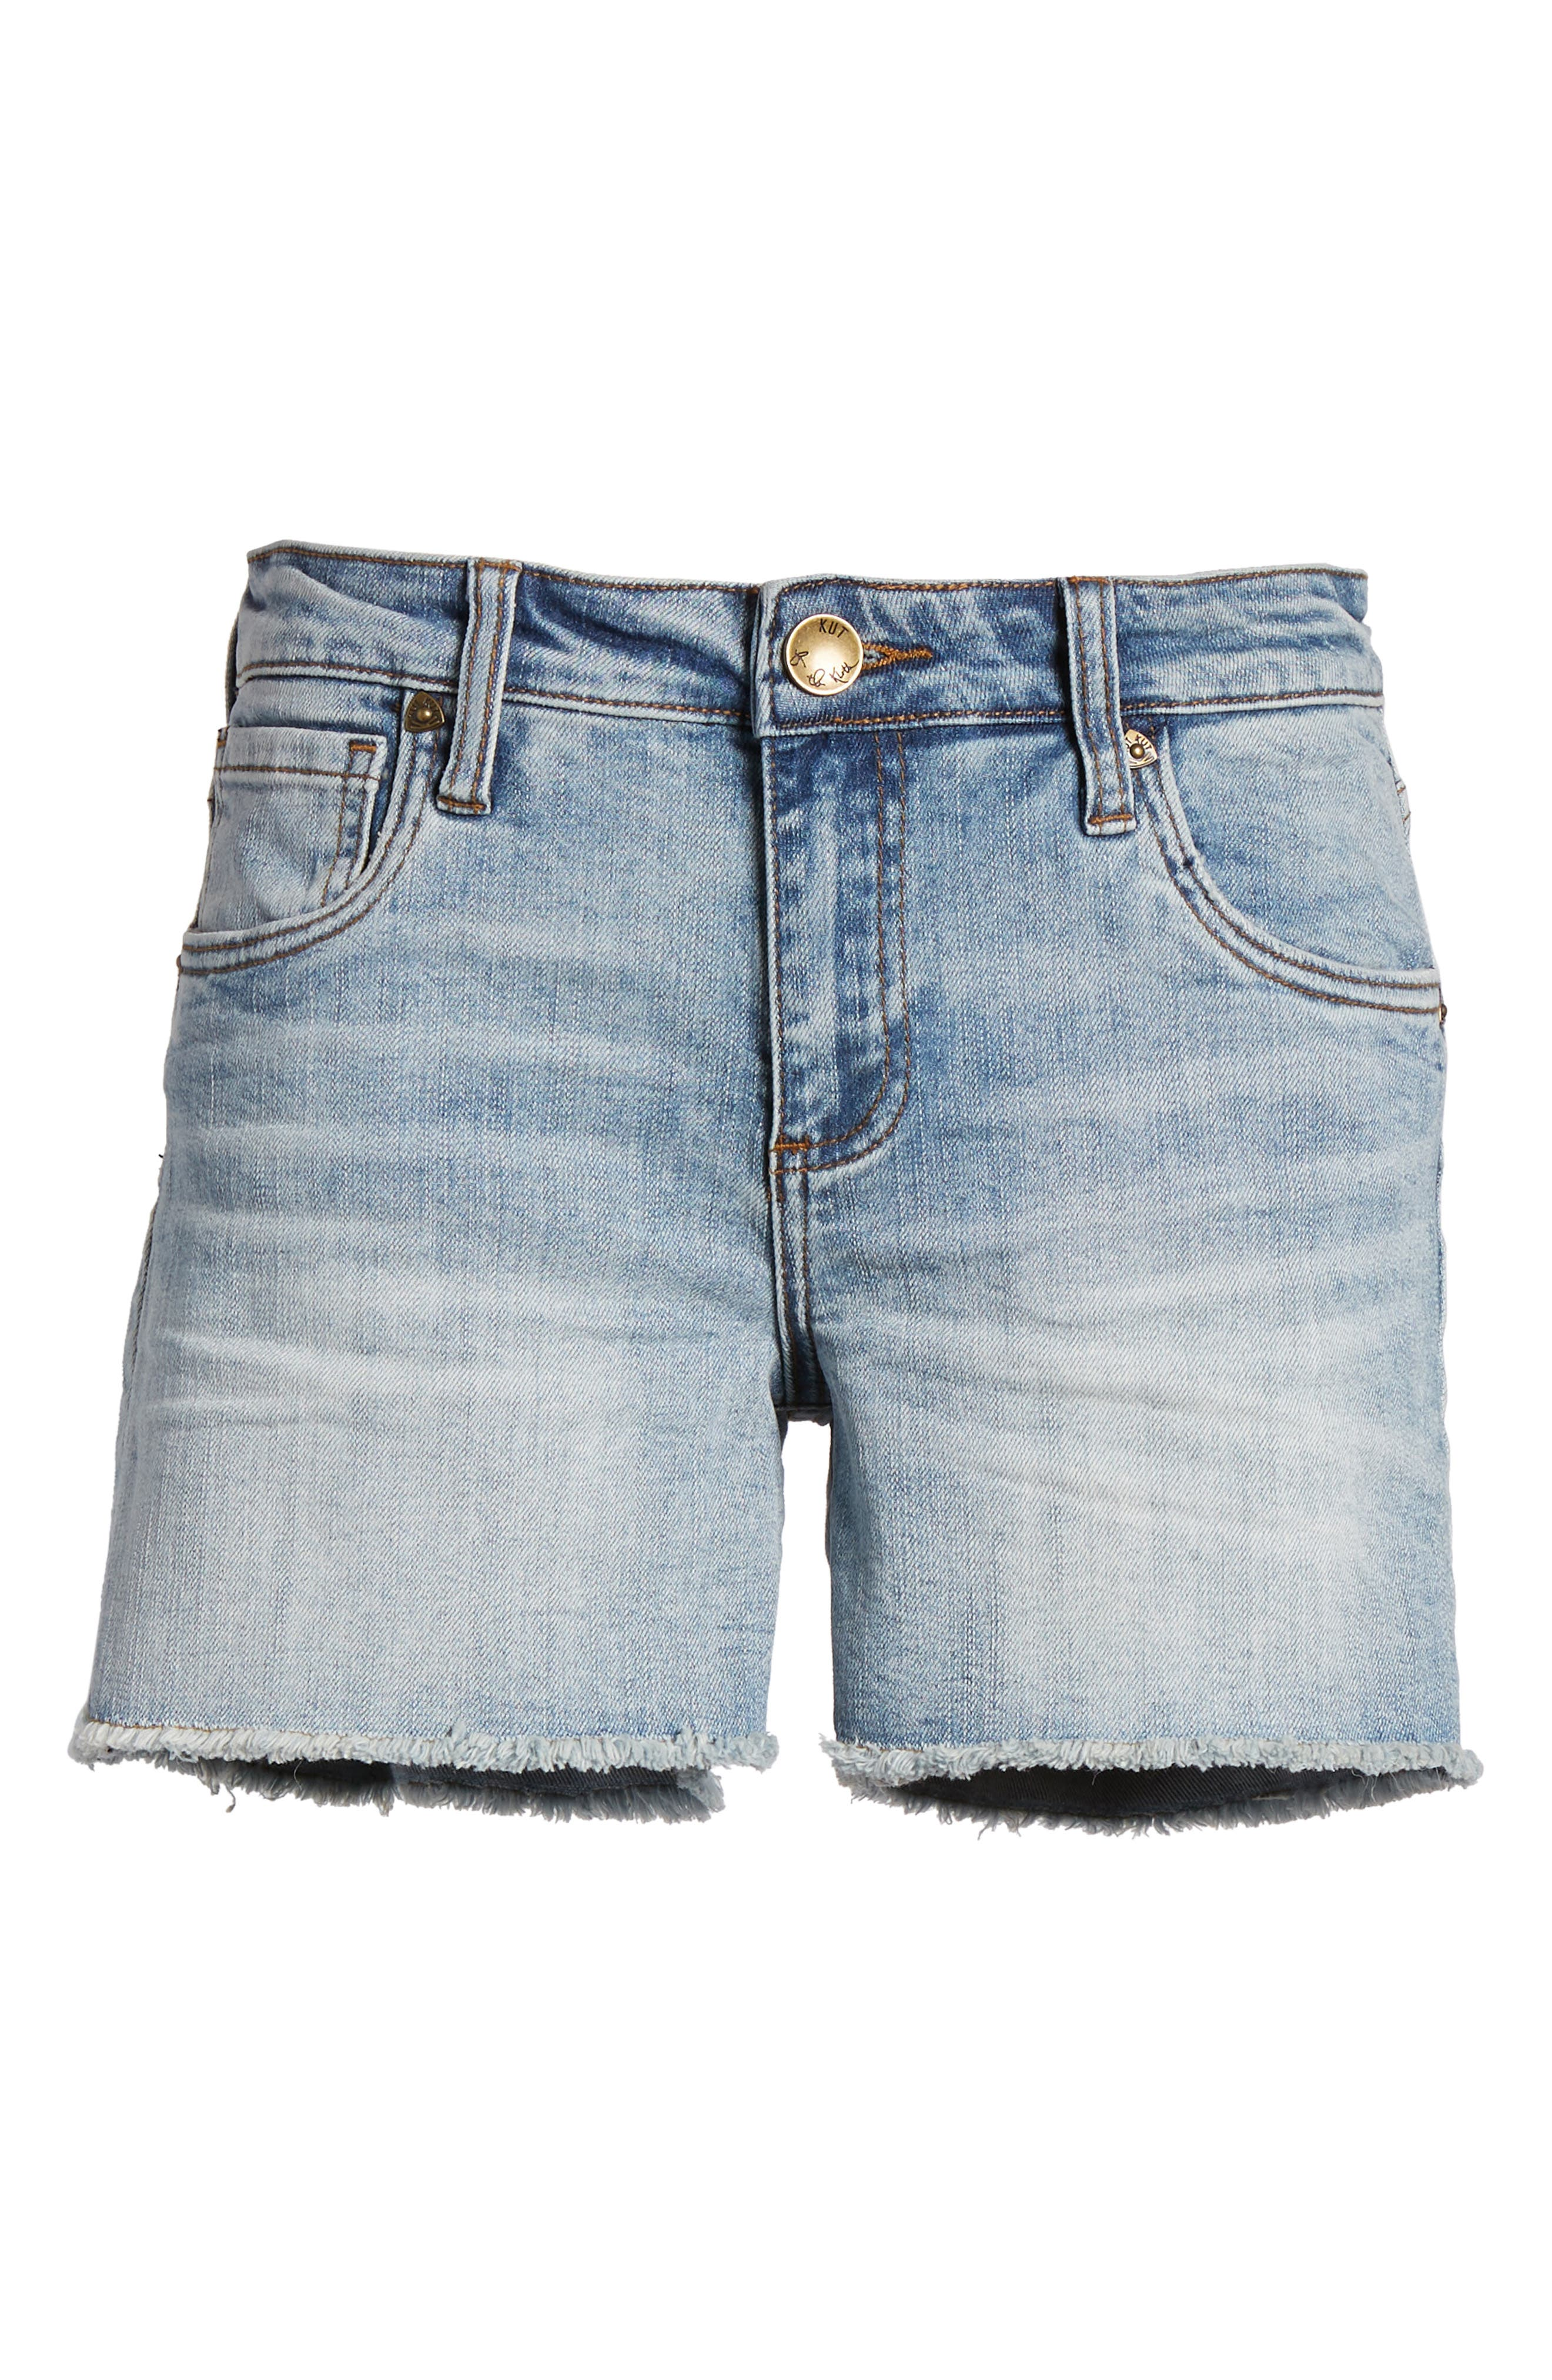 Gidget Cutoff Denim Shorts,                             Alternate thumbnail 7, color,                             470